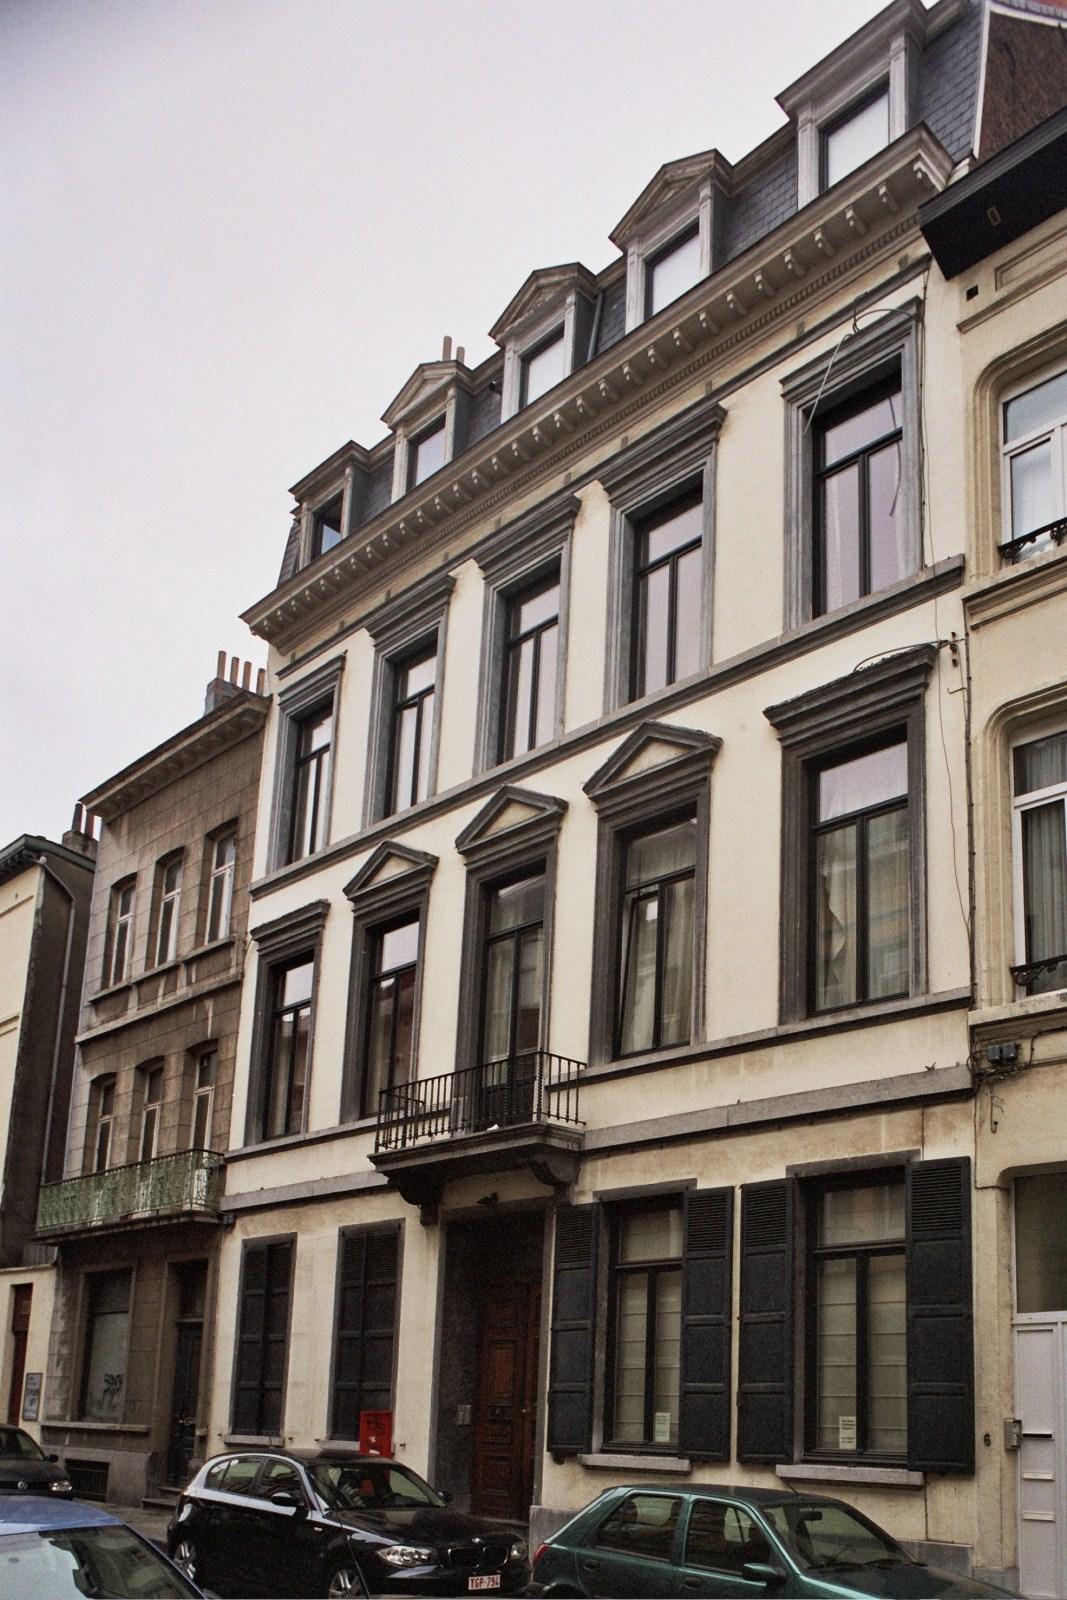 Raadstraat 4., 2009